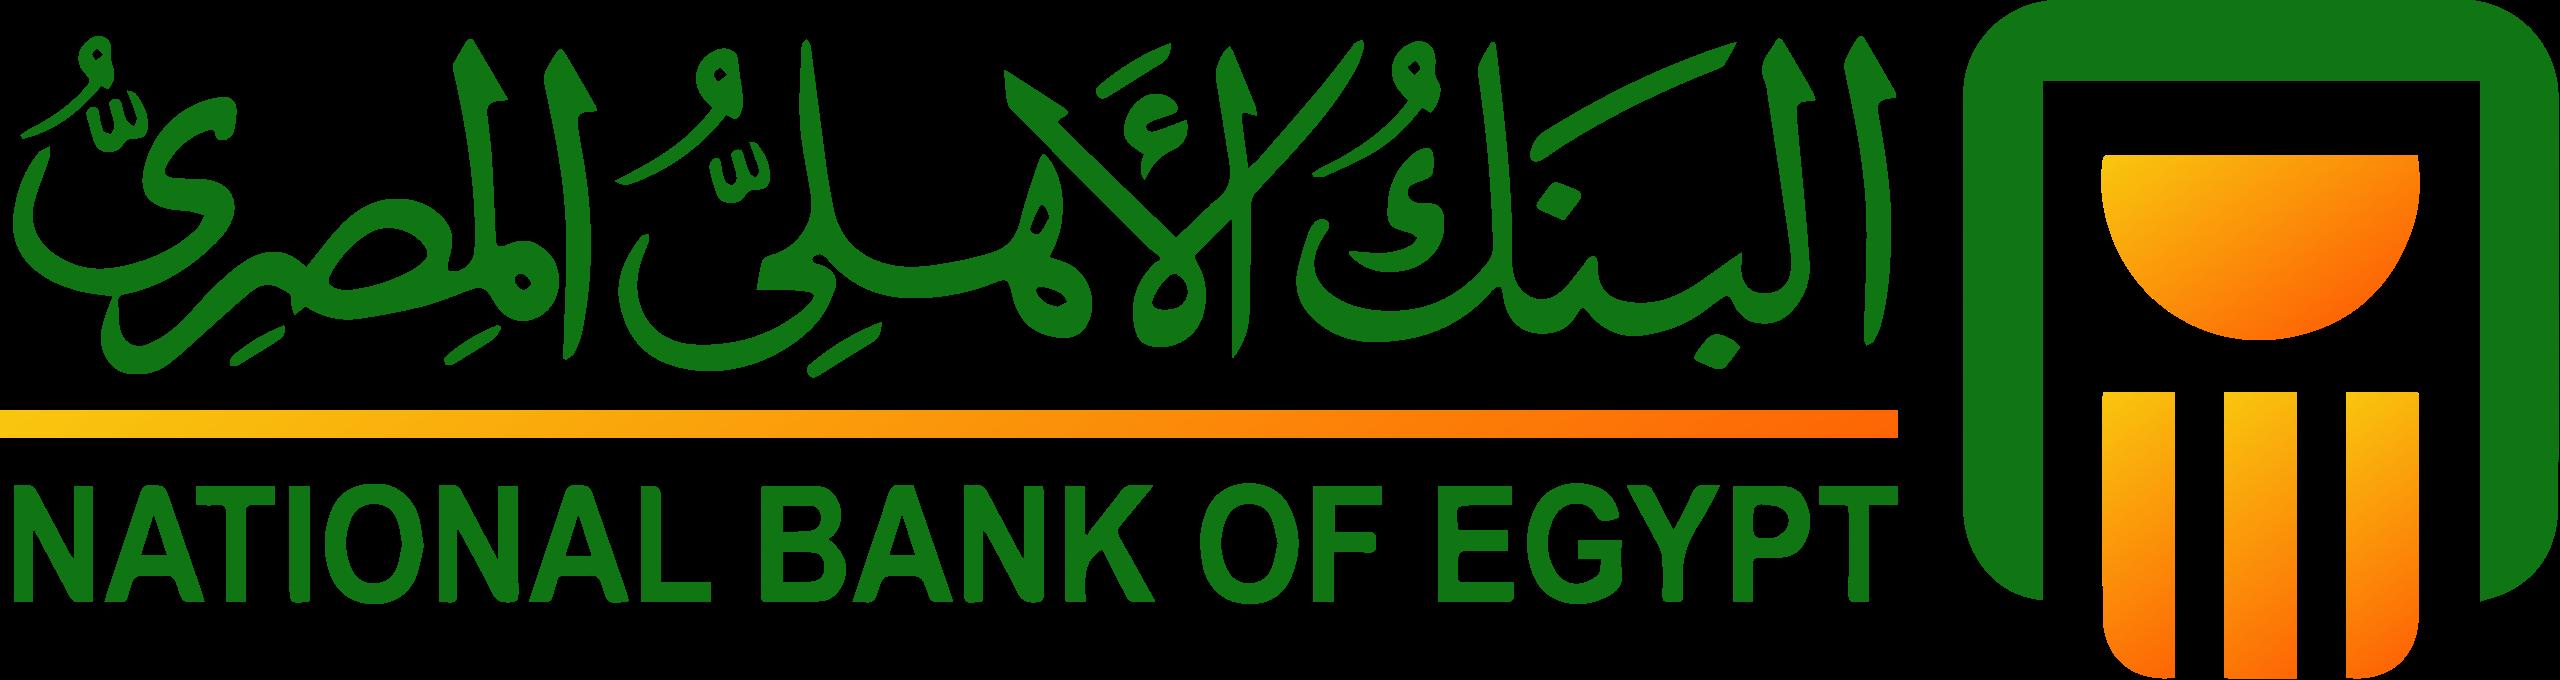 Банк - National Bank of Egypt